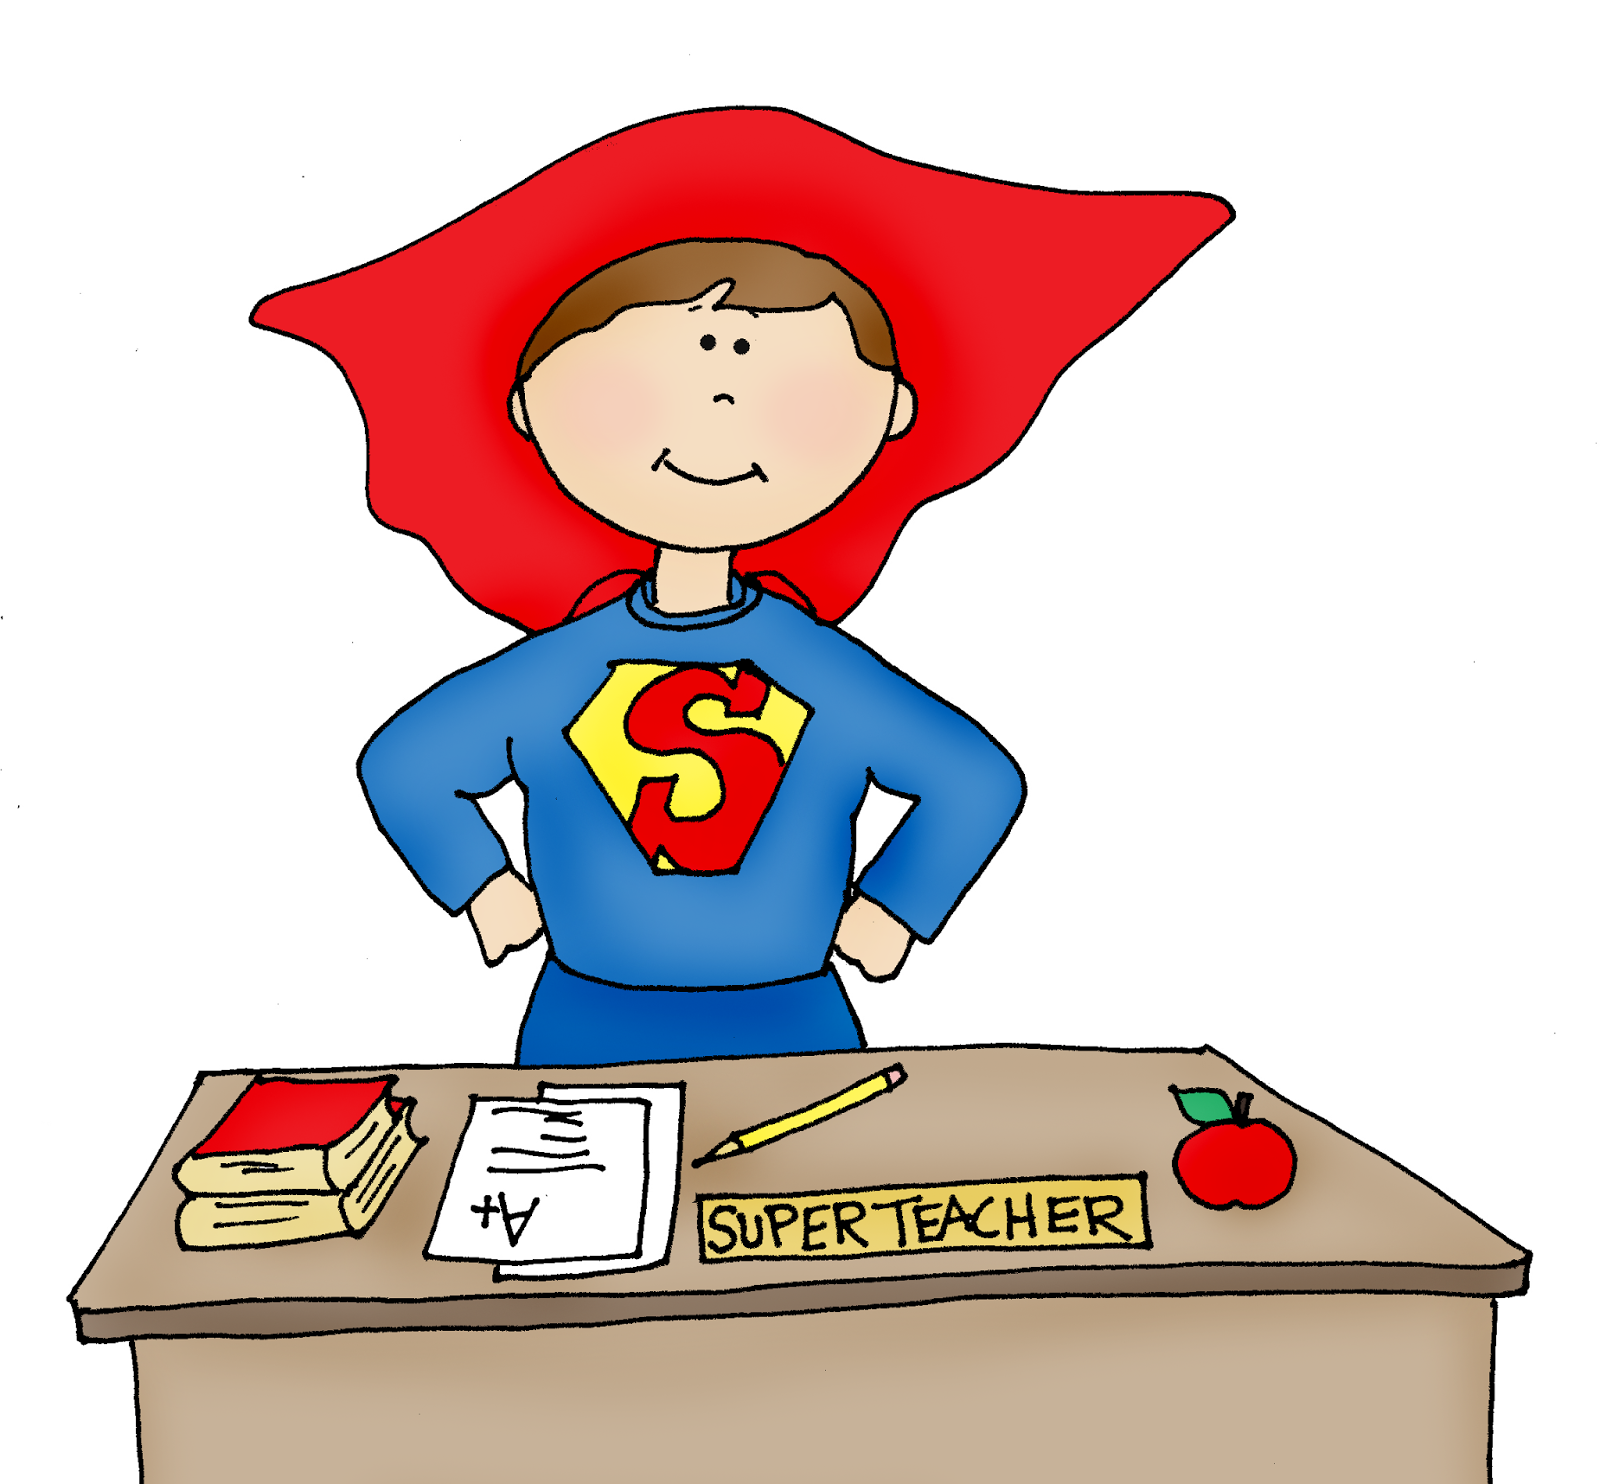 Super Teacher 2 Sample